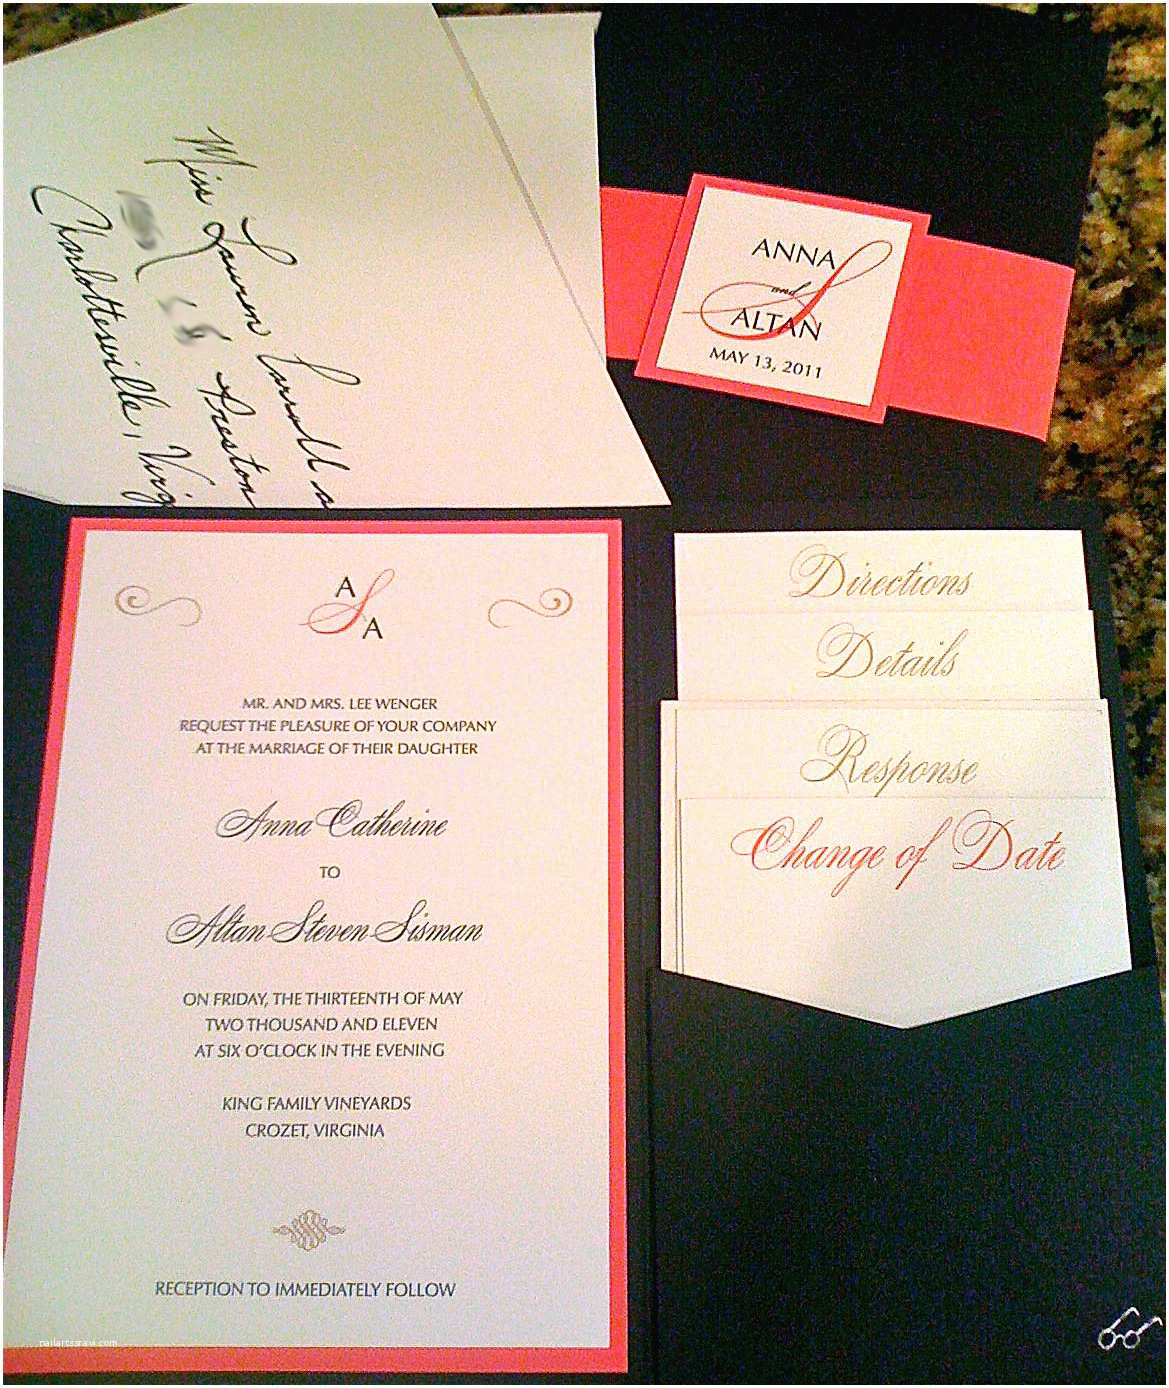 Diy Wedding Invitation Envelopes Simply Handwritten Diy Wedding Invitations and Envelope